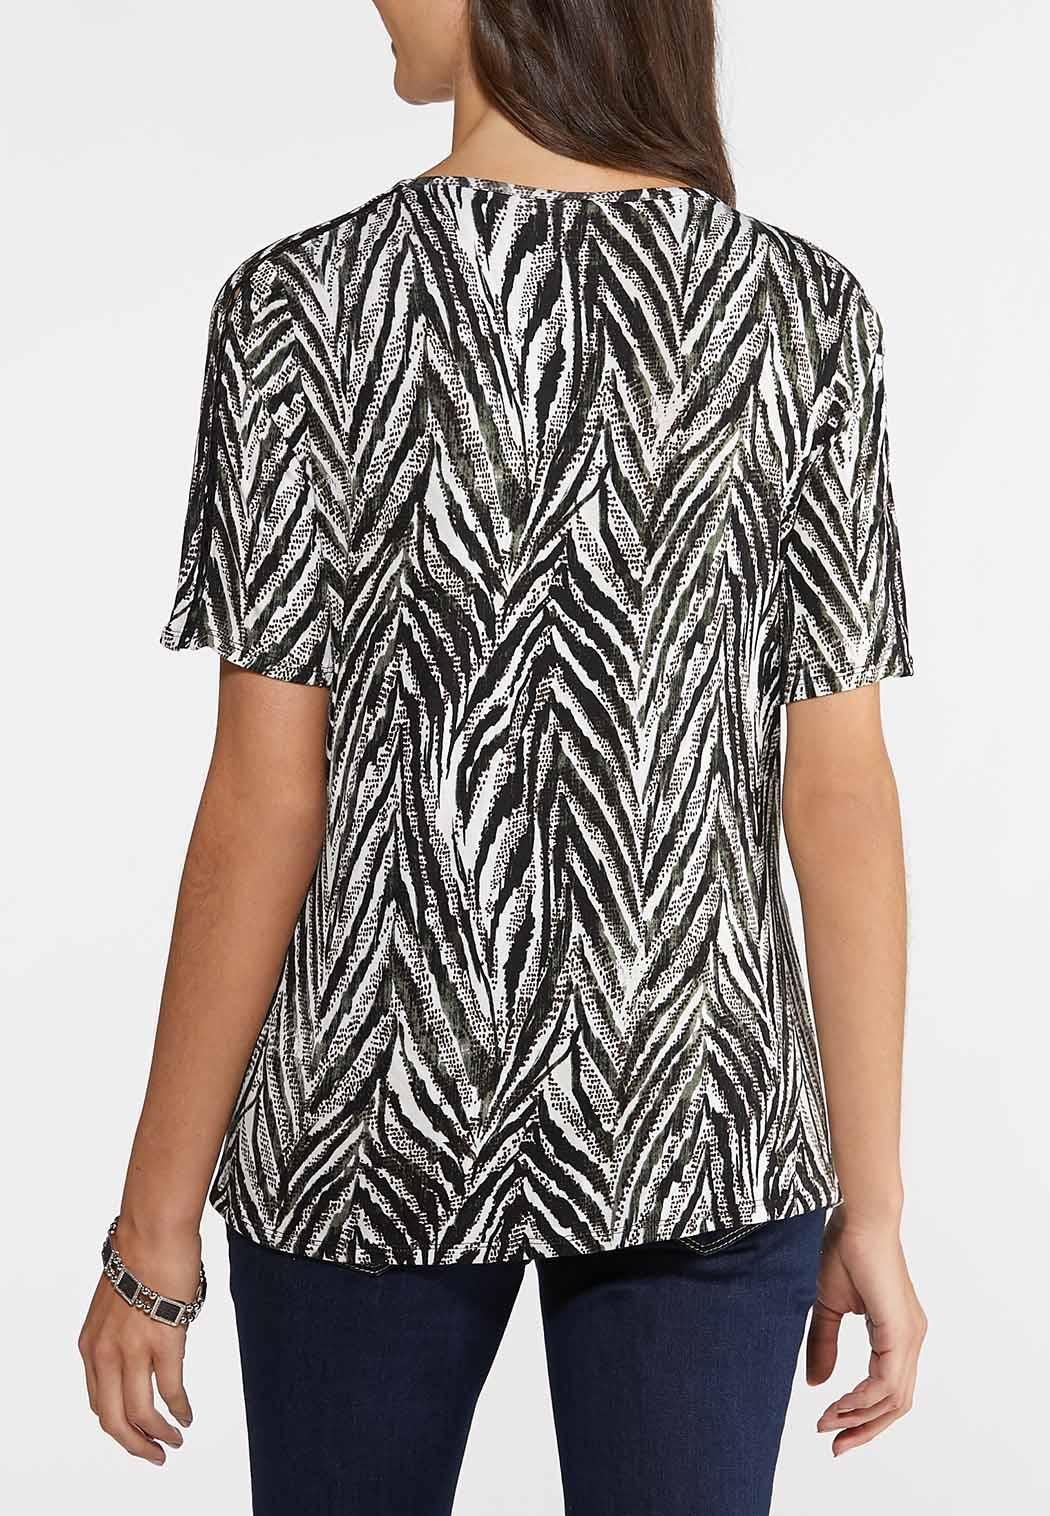 Lattice Sleeve Zebra Top (Item #43903970)